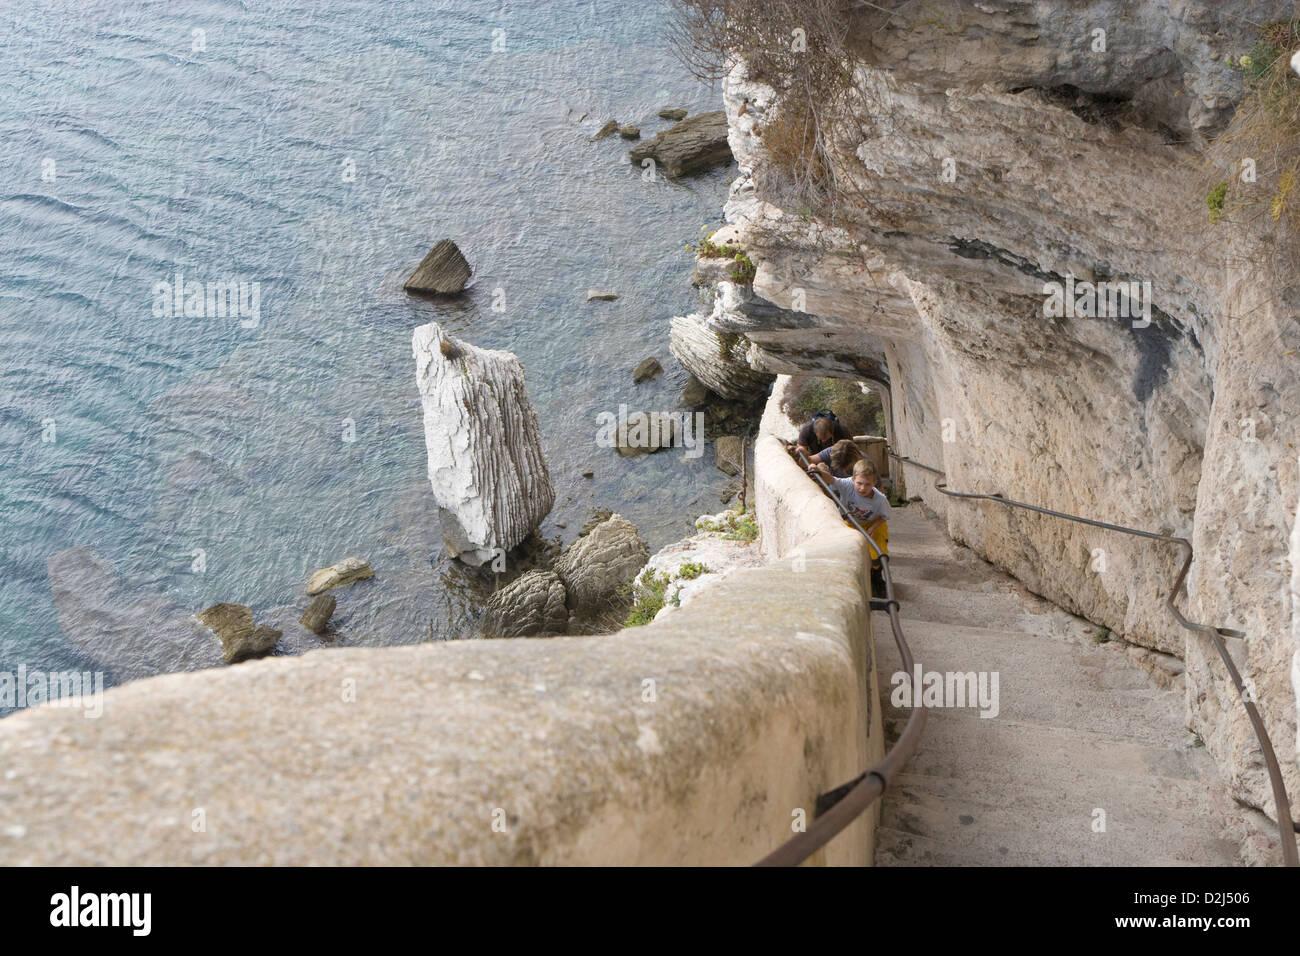 Córcega: Bonifacio - Escalier du Roi d'Aragon pasos [187] Foto de stock